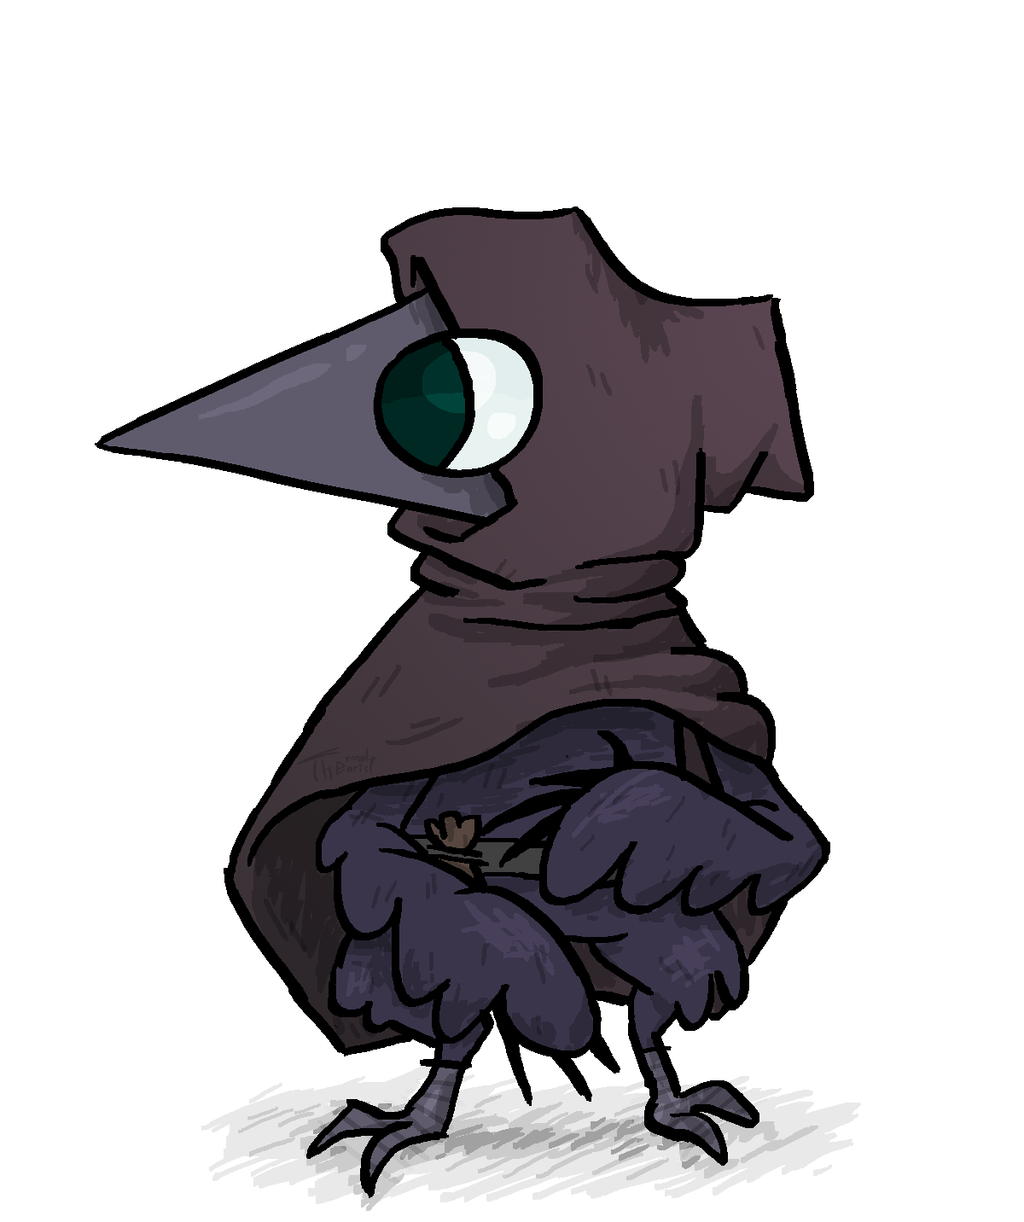 Birdstealer by ThermalTheorist